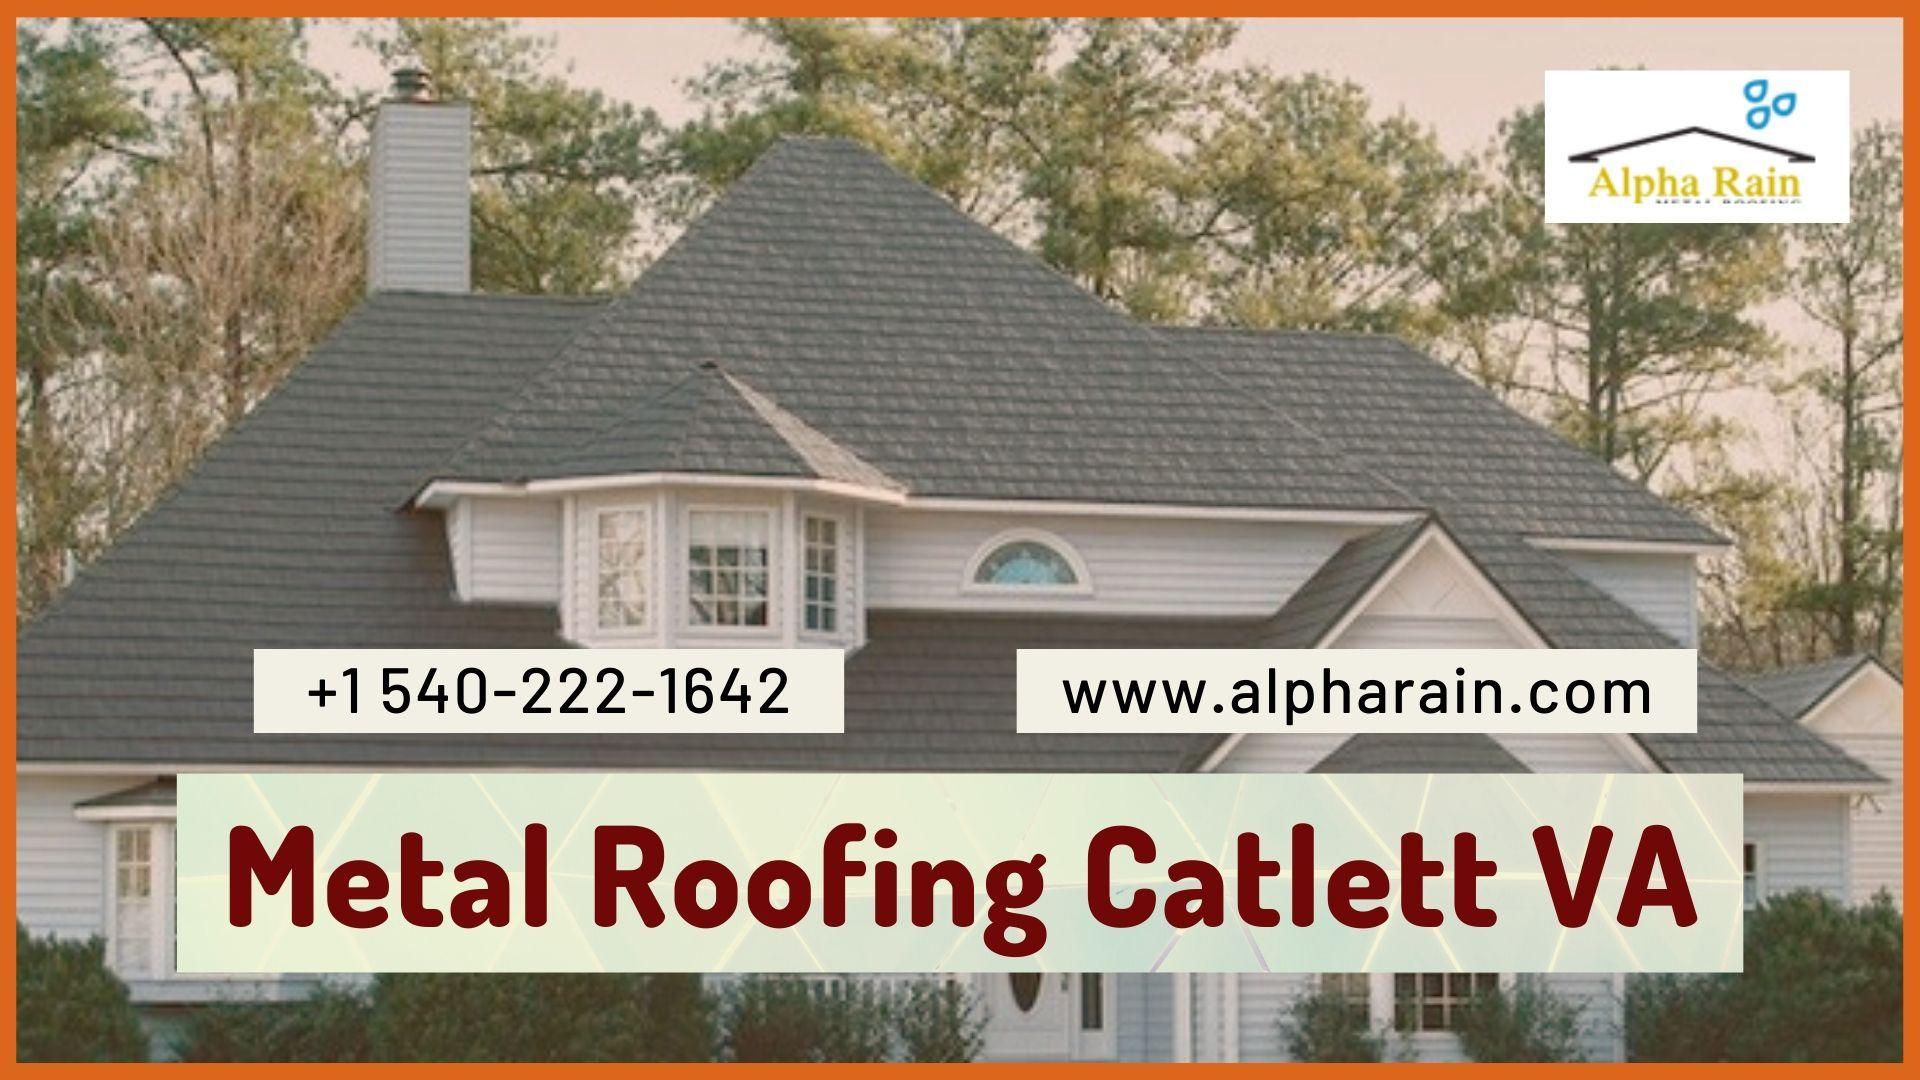 Under Roof Ventilation Roofing Metal Roof Ventilation System